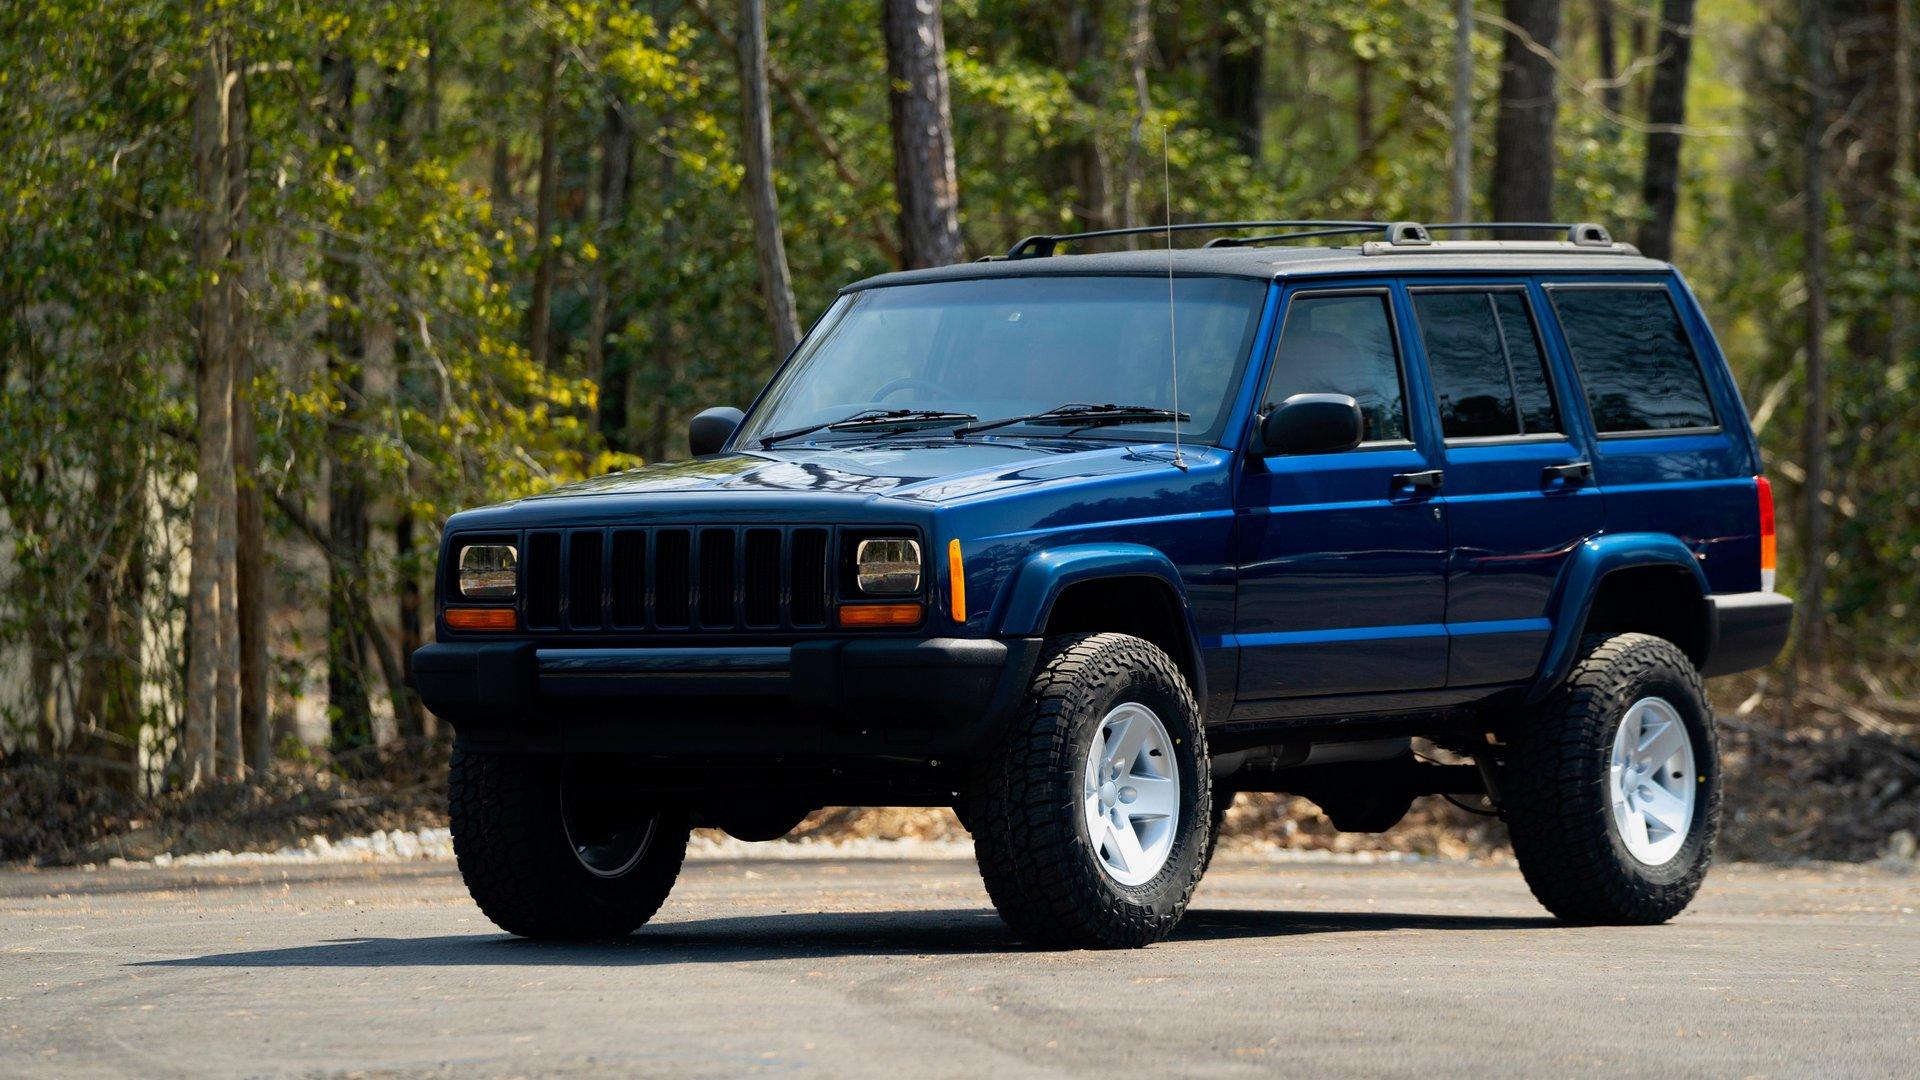 2001 jeep cherokee restored stage 2 xj